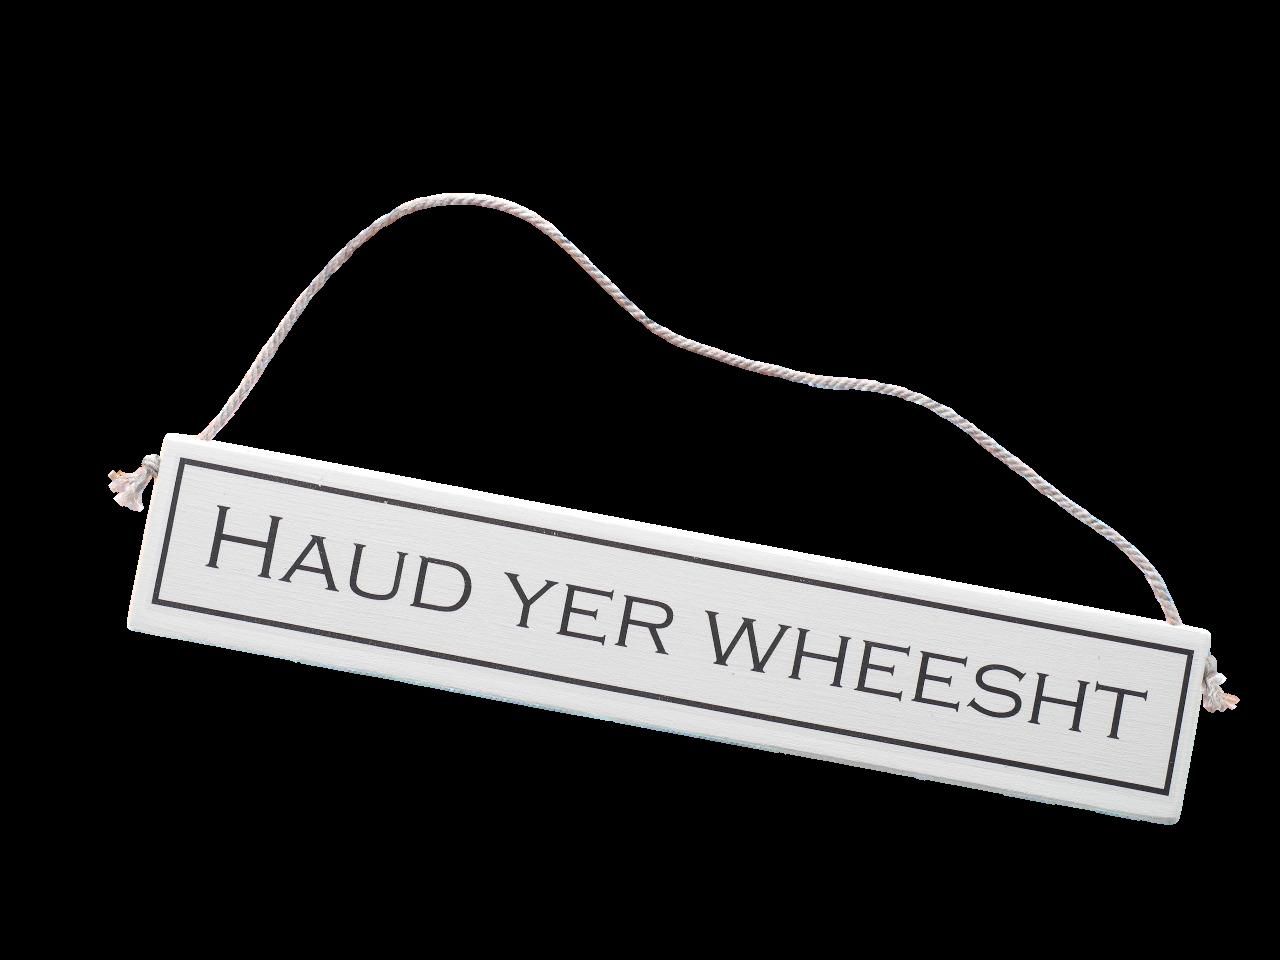 scottish doric sayings scots language gift plaque haud yer wheesht